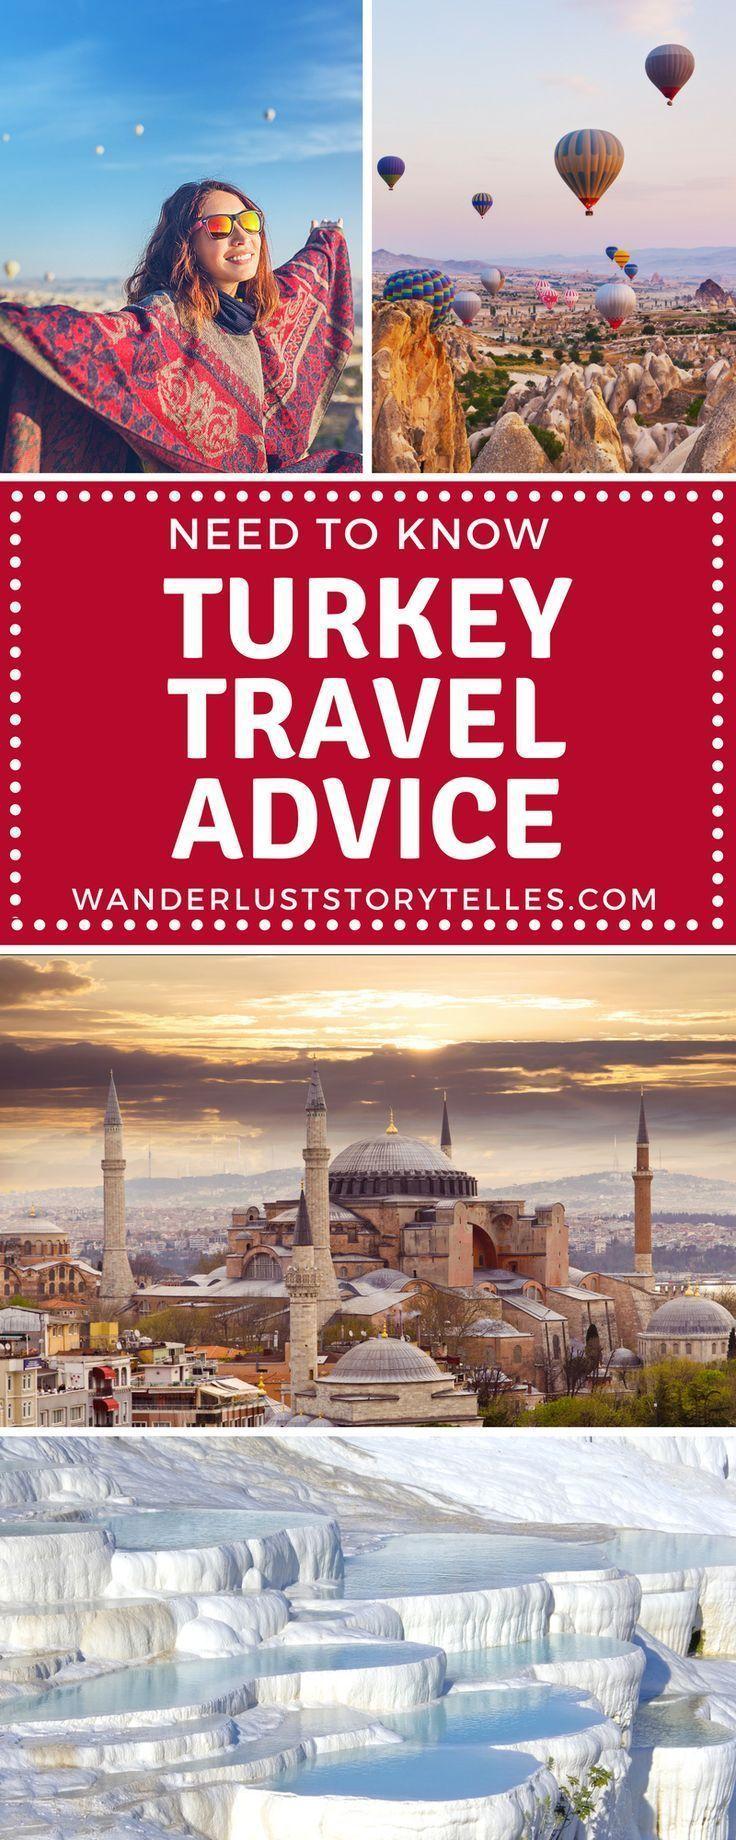 Essential Turkey Travel Advice Travel Tips That You Should Know Turkey Vacation Turkey Travel Travel Advice